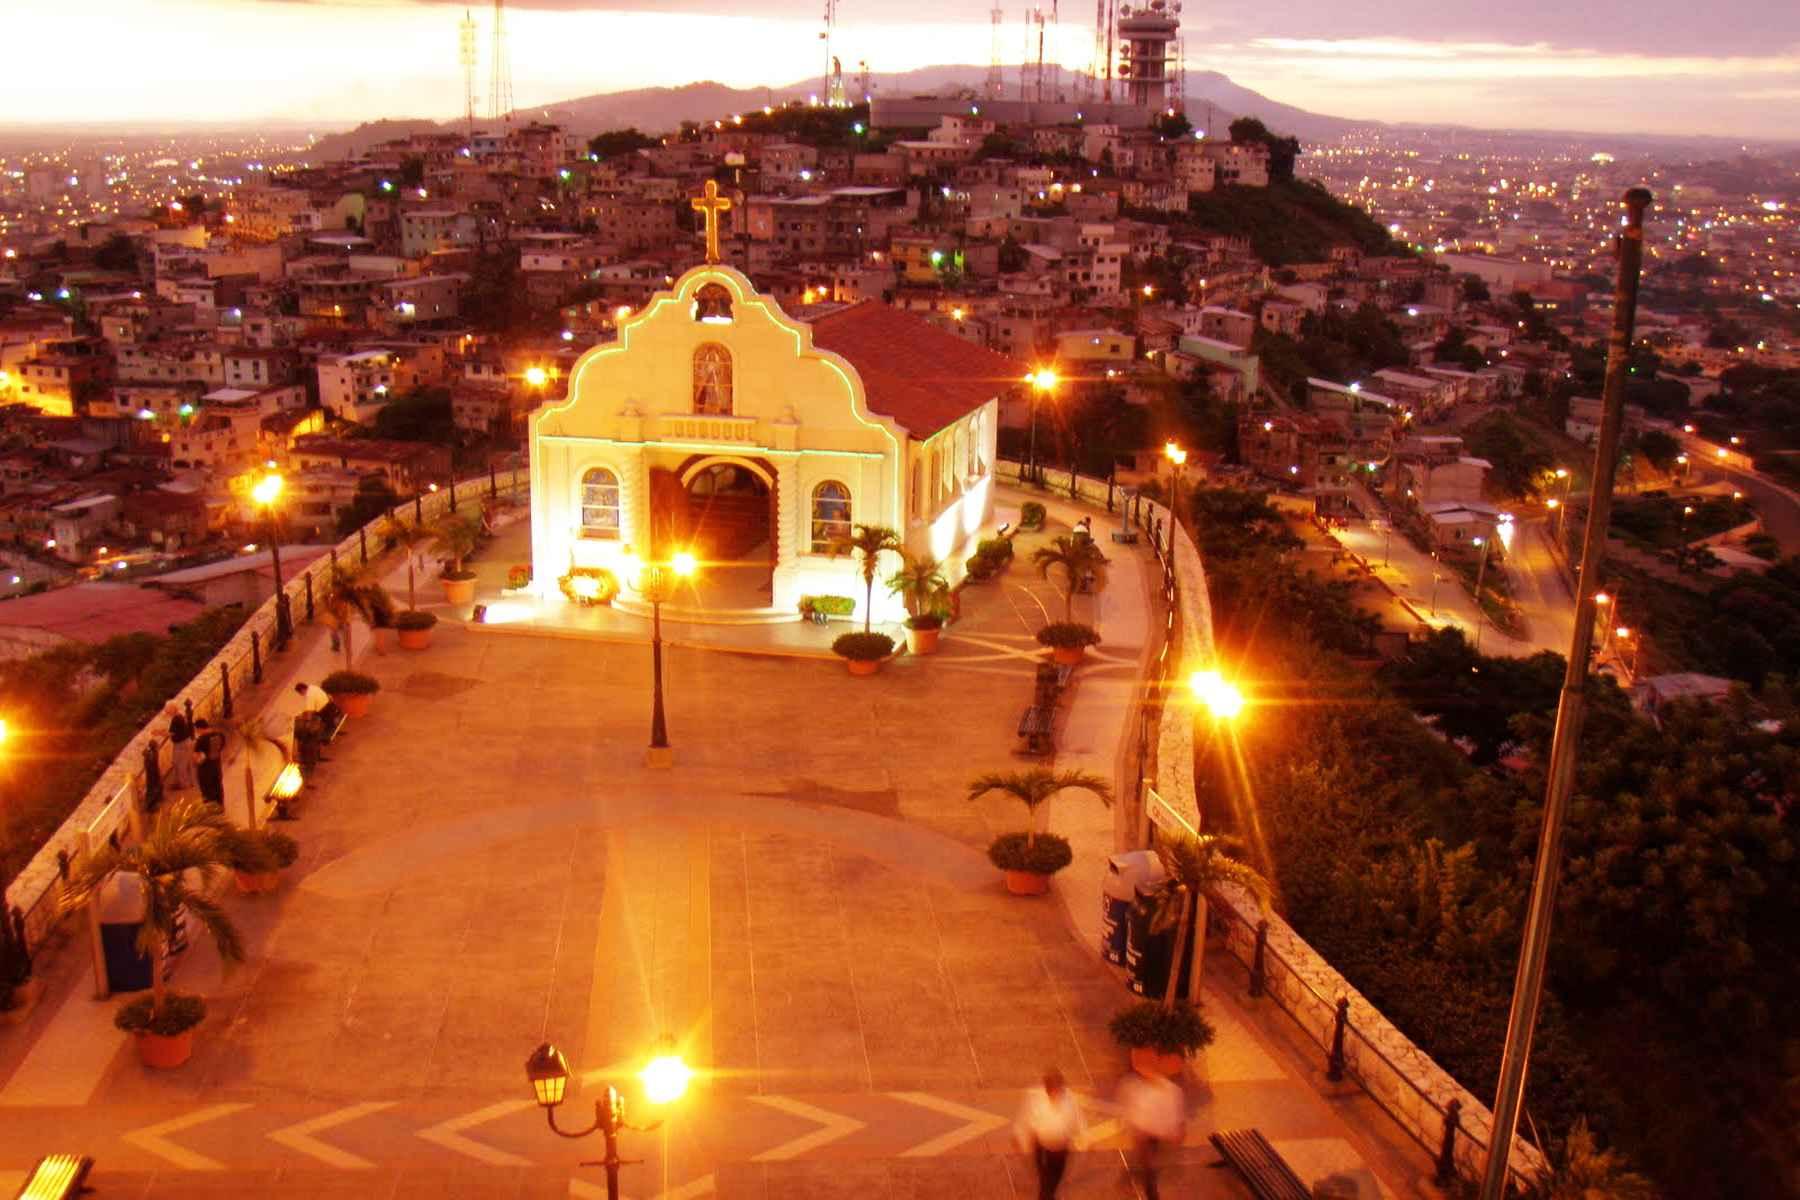 Интересно знать : Гуаякиль - город над побережьем Тихоокеанского побережья